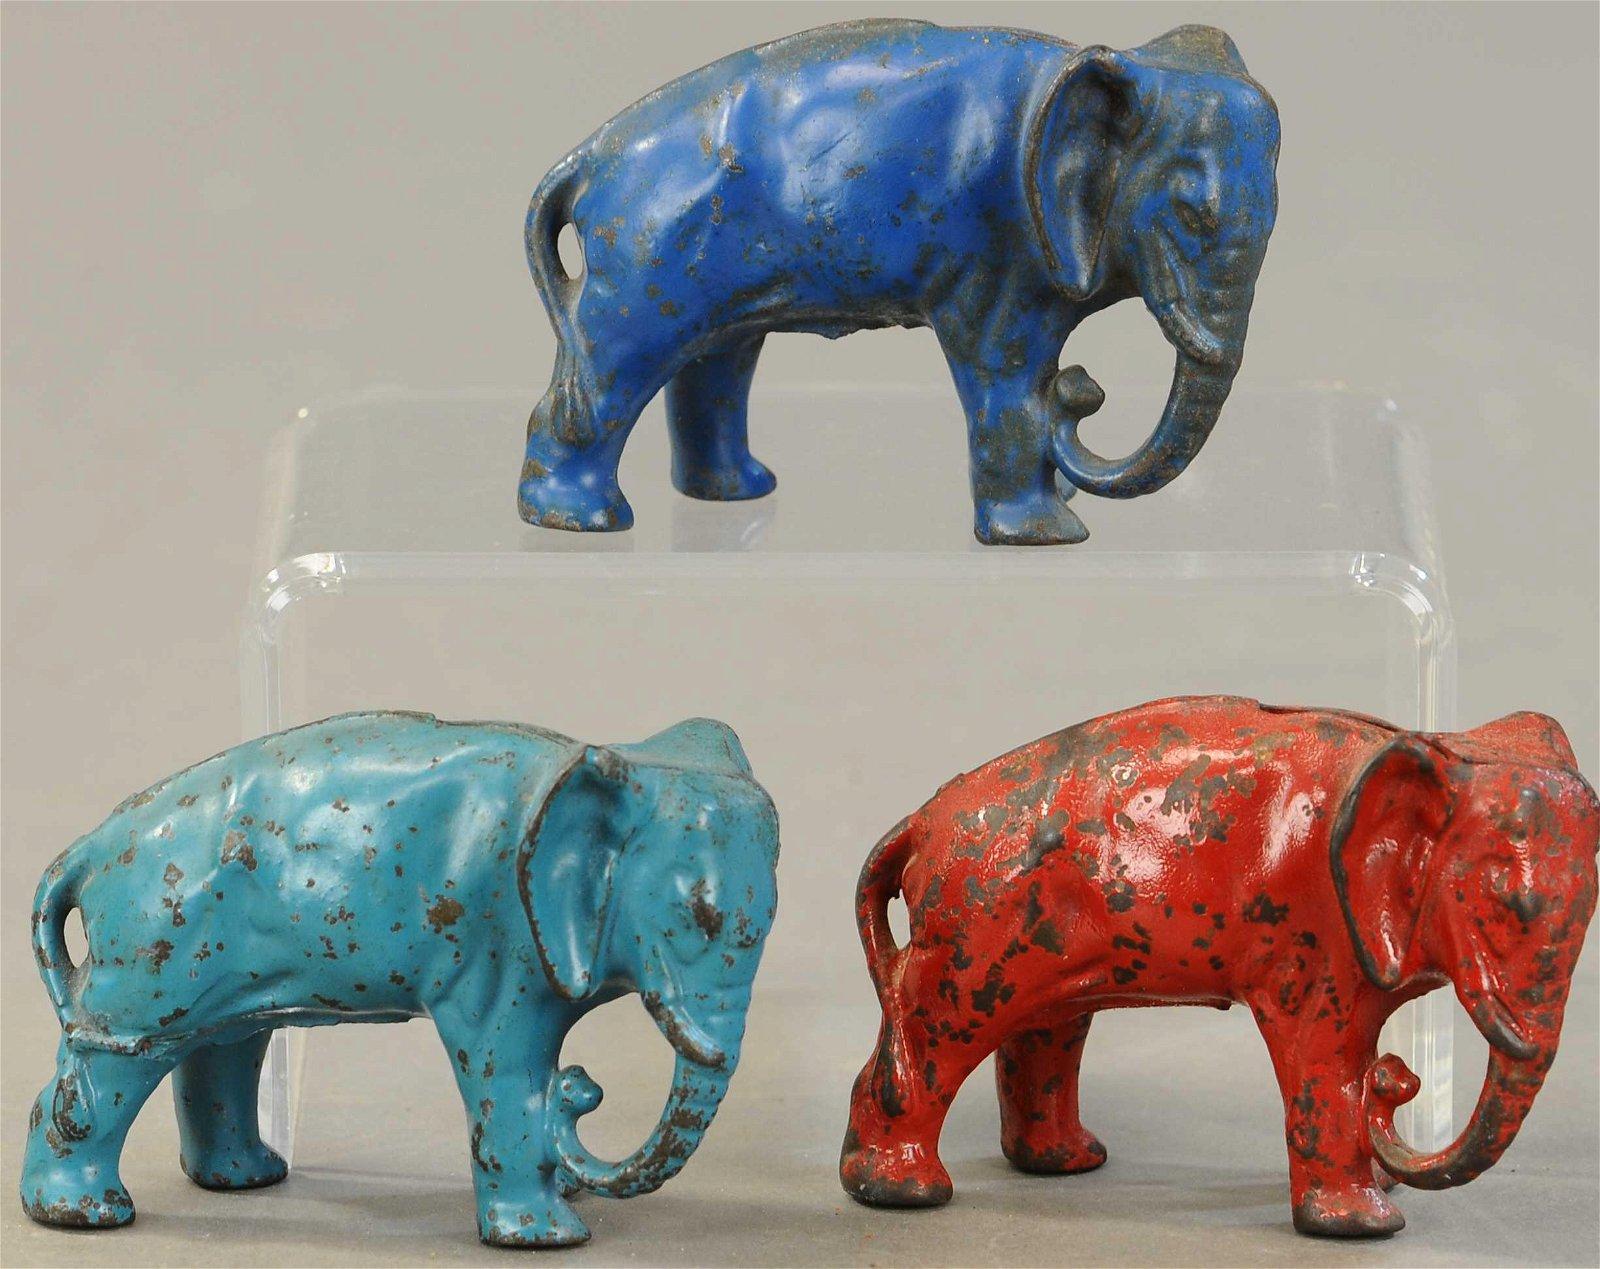 THREE PAINTED ARCADE ELEPHANT BANKS